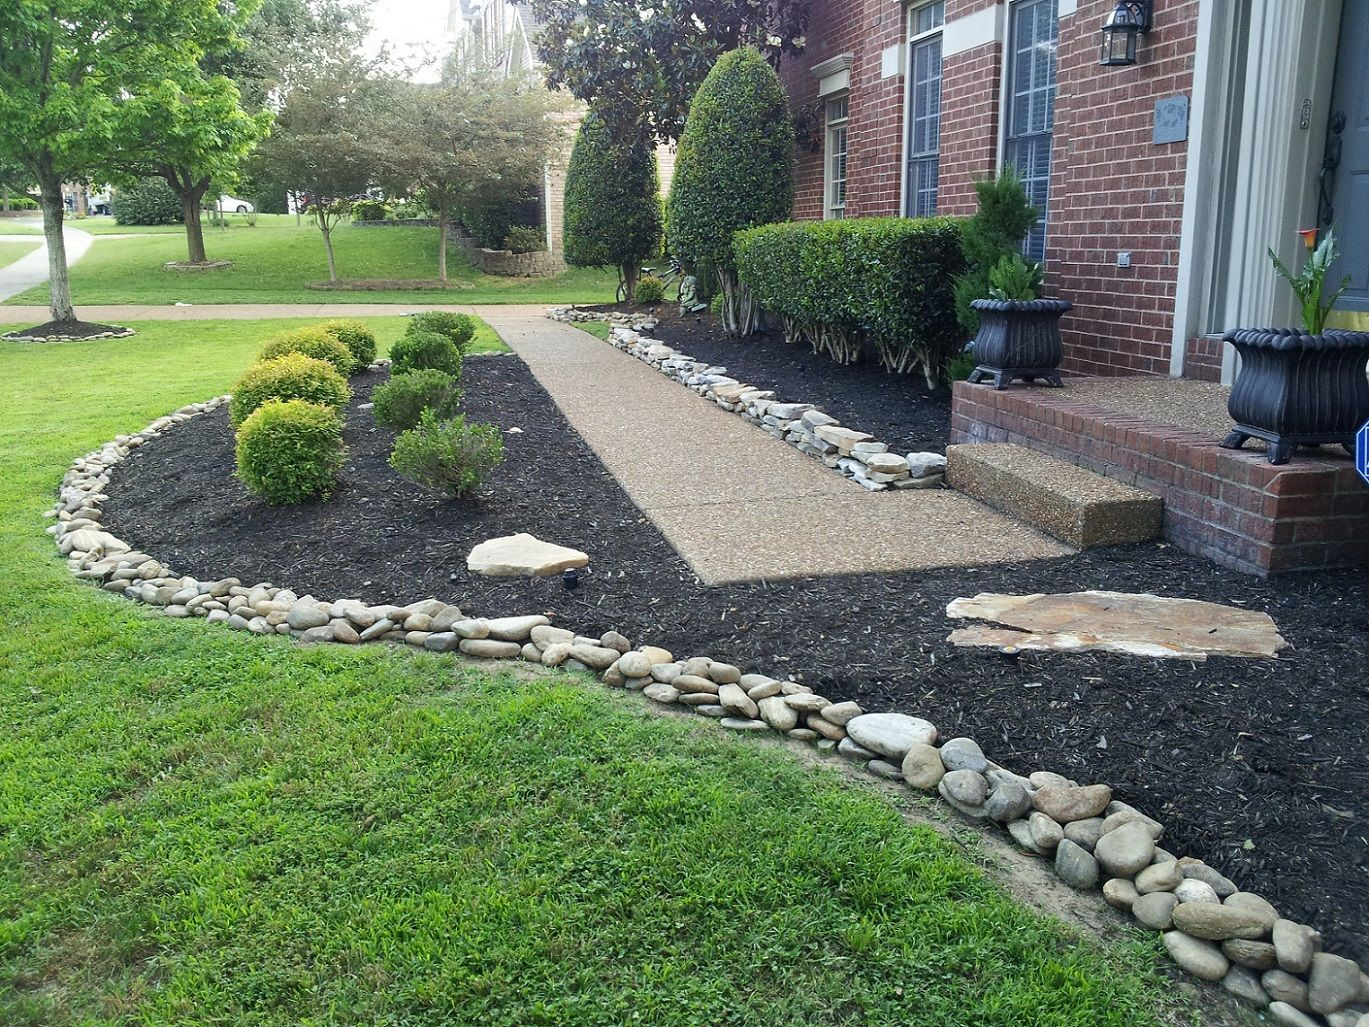 Jolly Decorative Rock Garden Ideas Decorative Pinterest Small Rock Garden Ideas Rock Garden Ideas